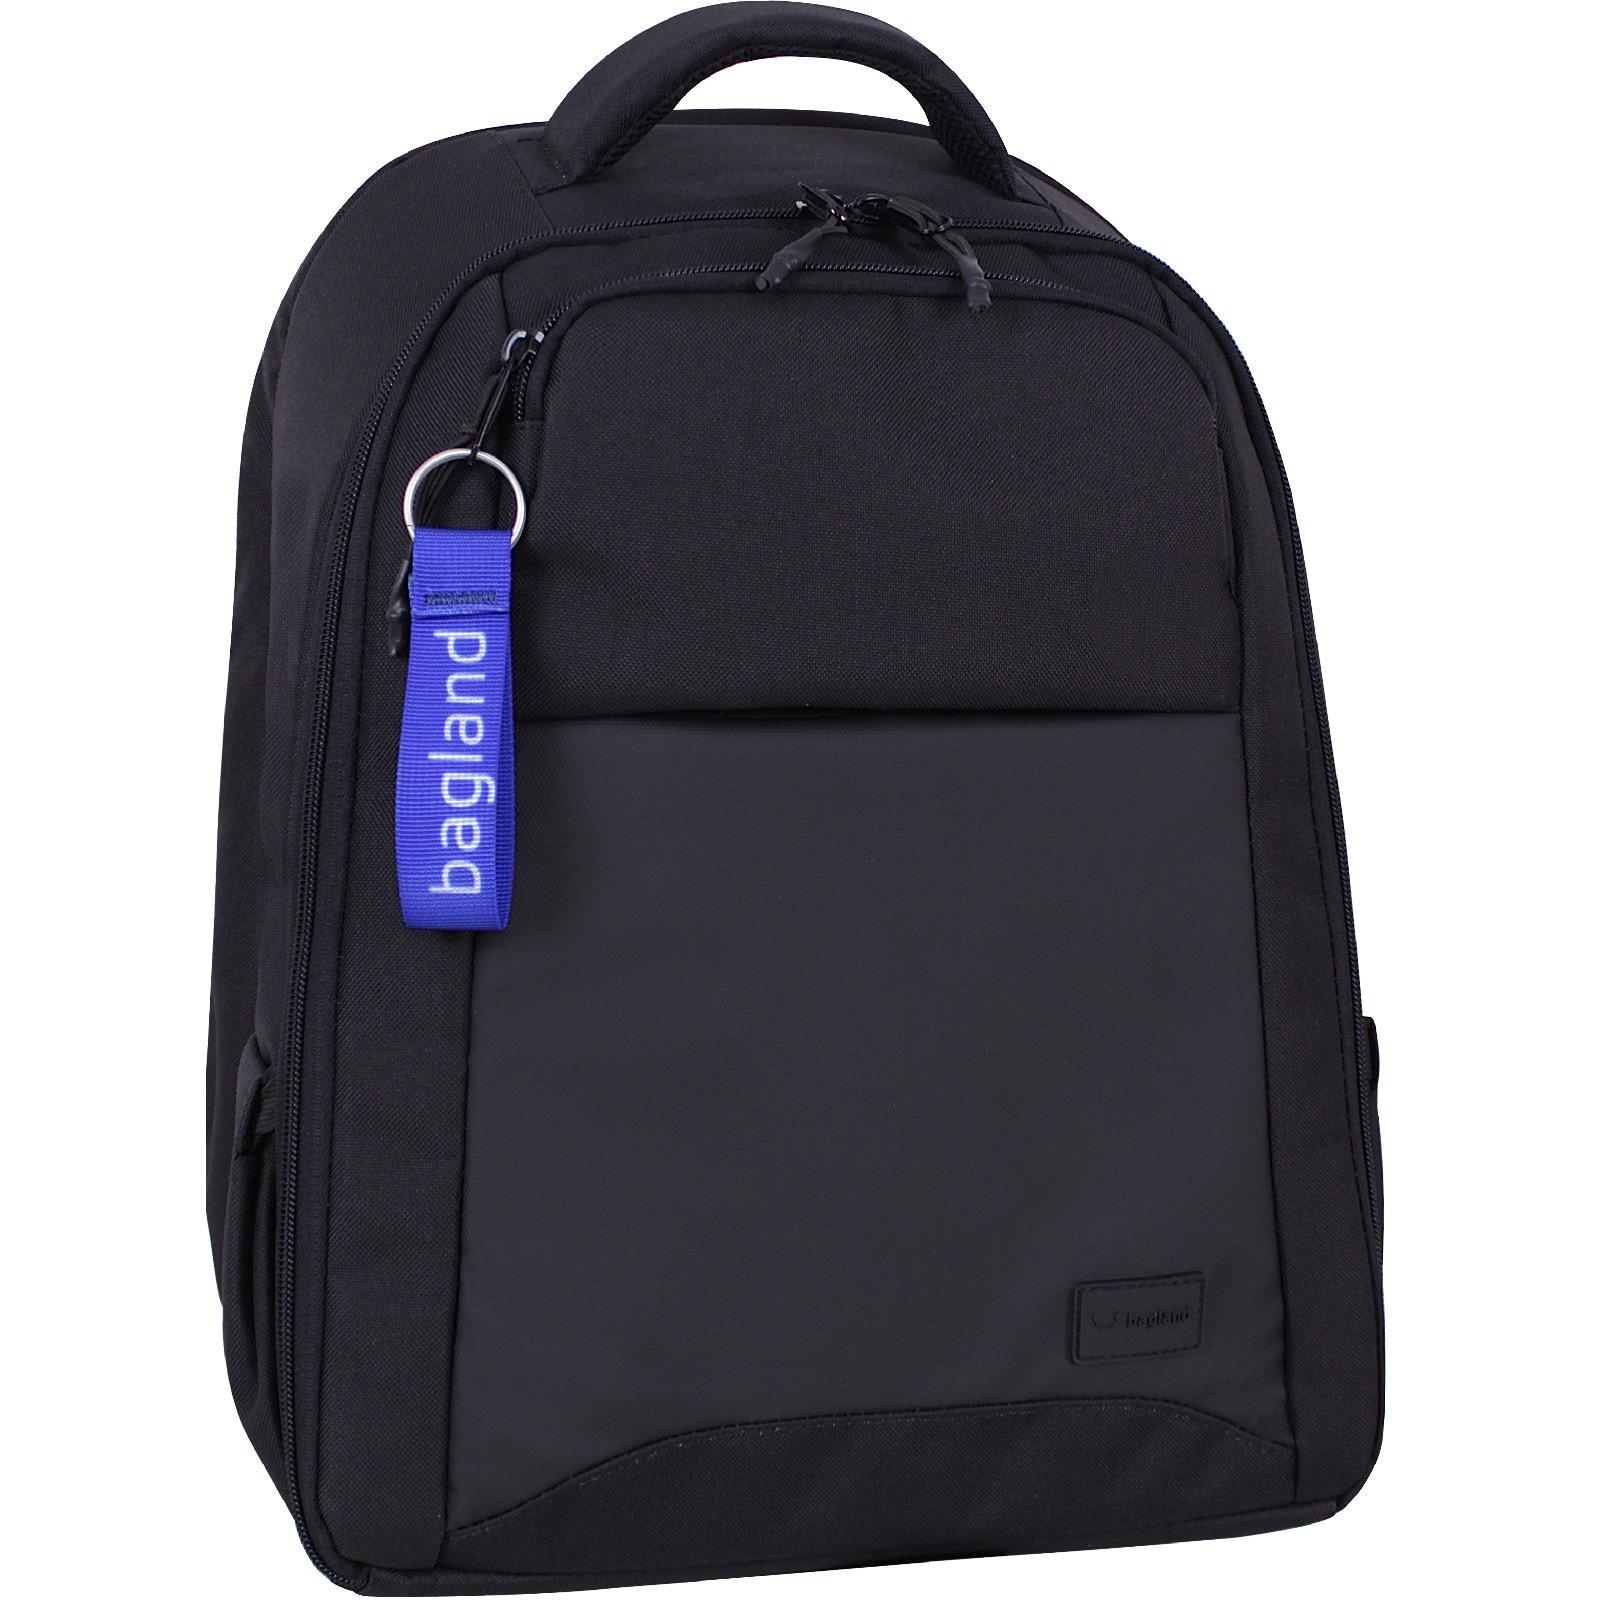 Мужские рюкзаки Рюкзак Bagland Бремен 23 л. Чёрный/кожзам (0016566) IMG_0136.JPG